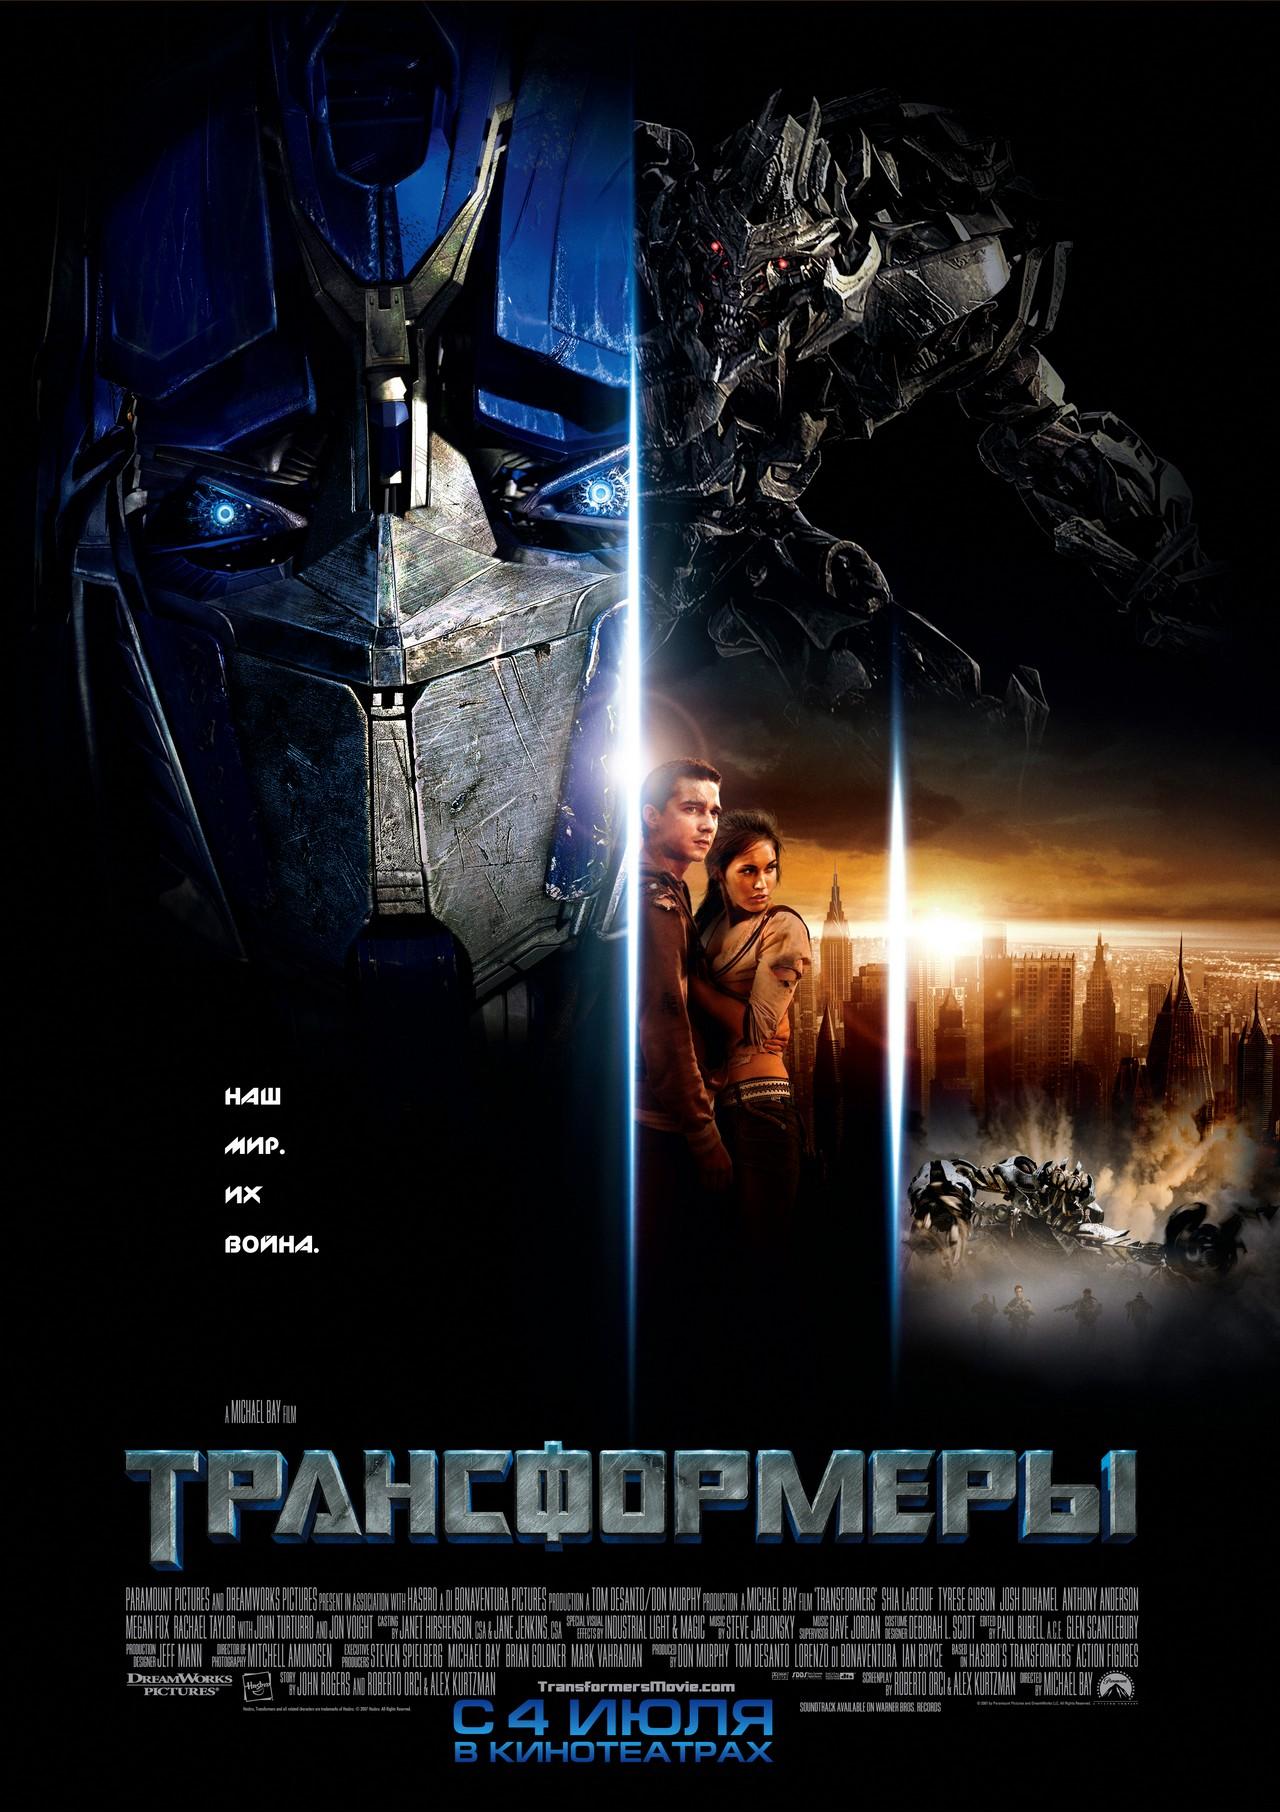 vse-chasti-filma-transformeri-po-poryadku-akteri